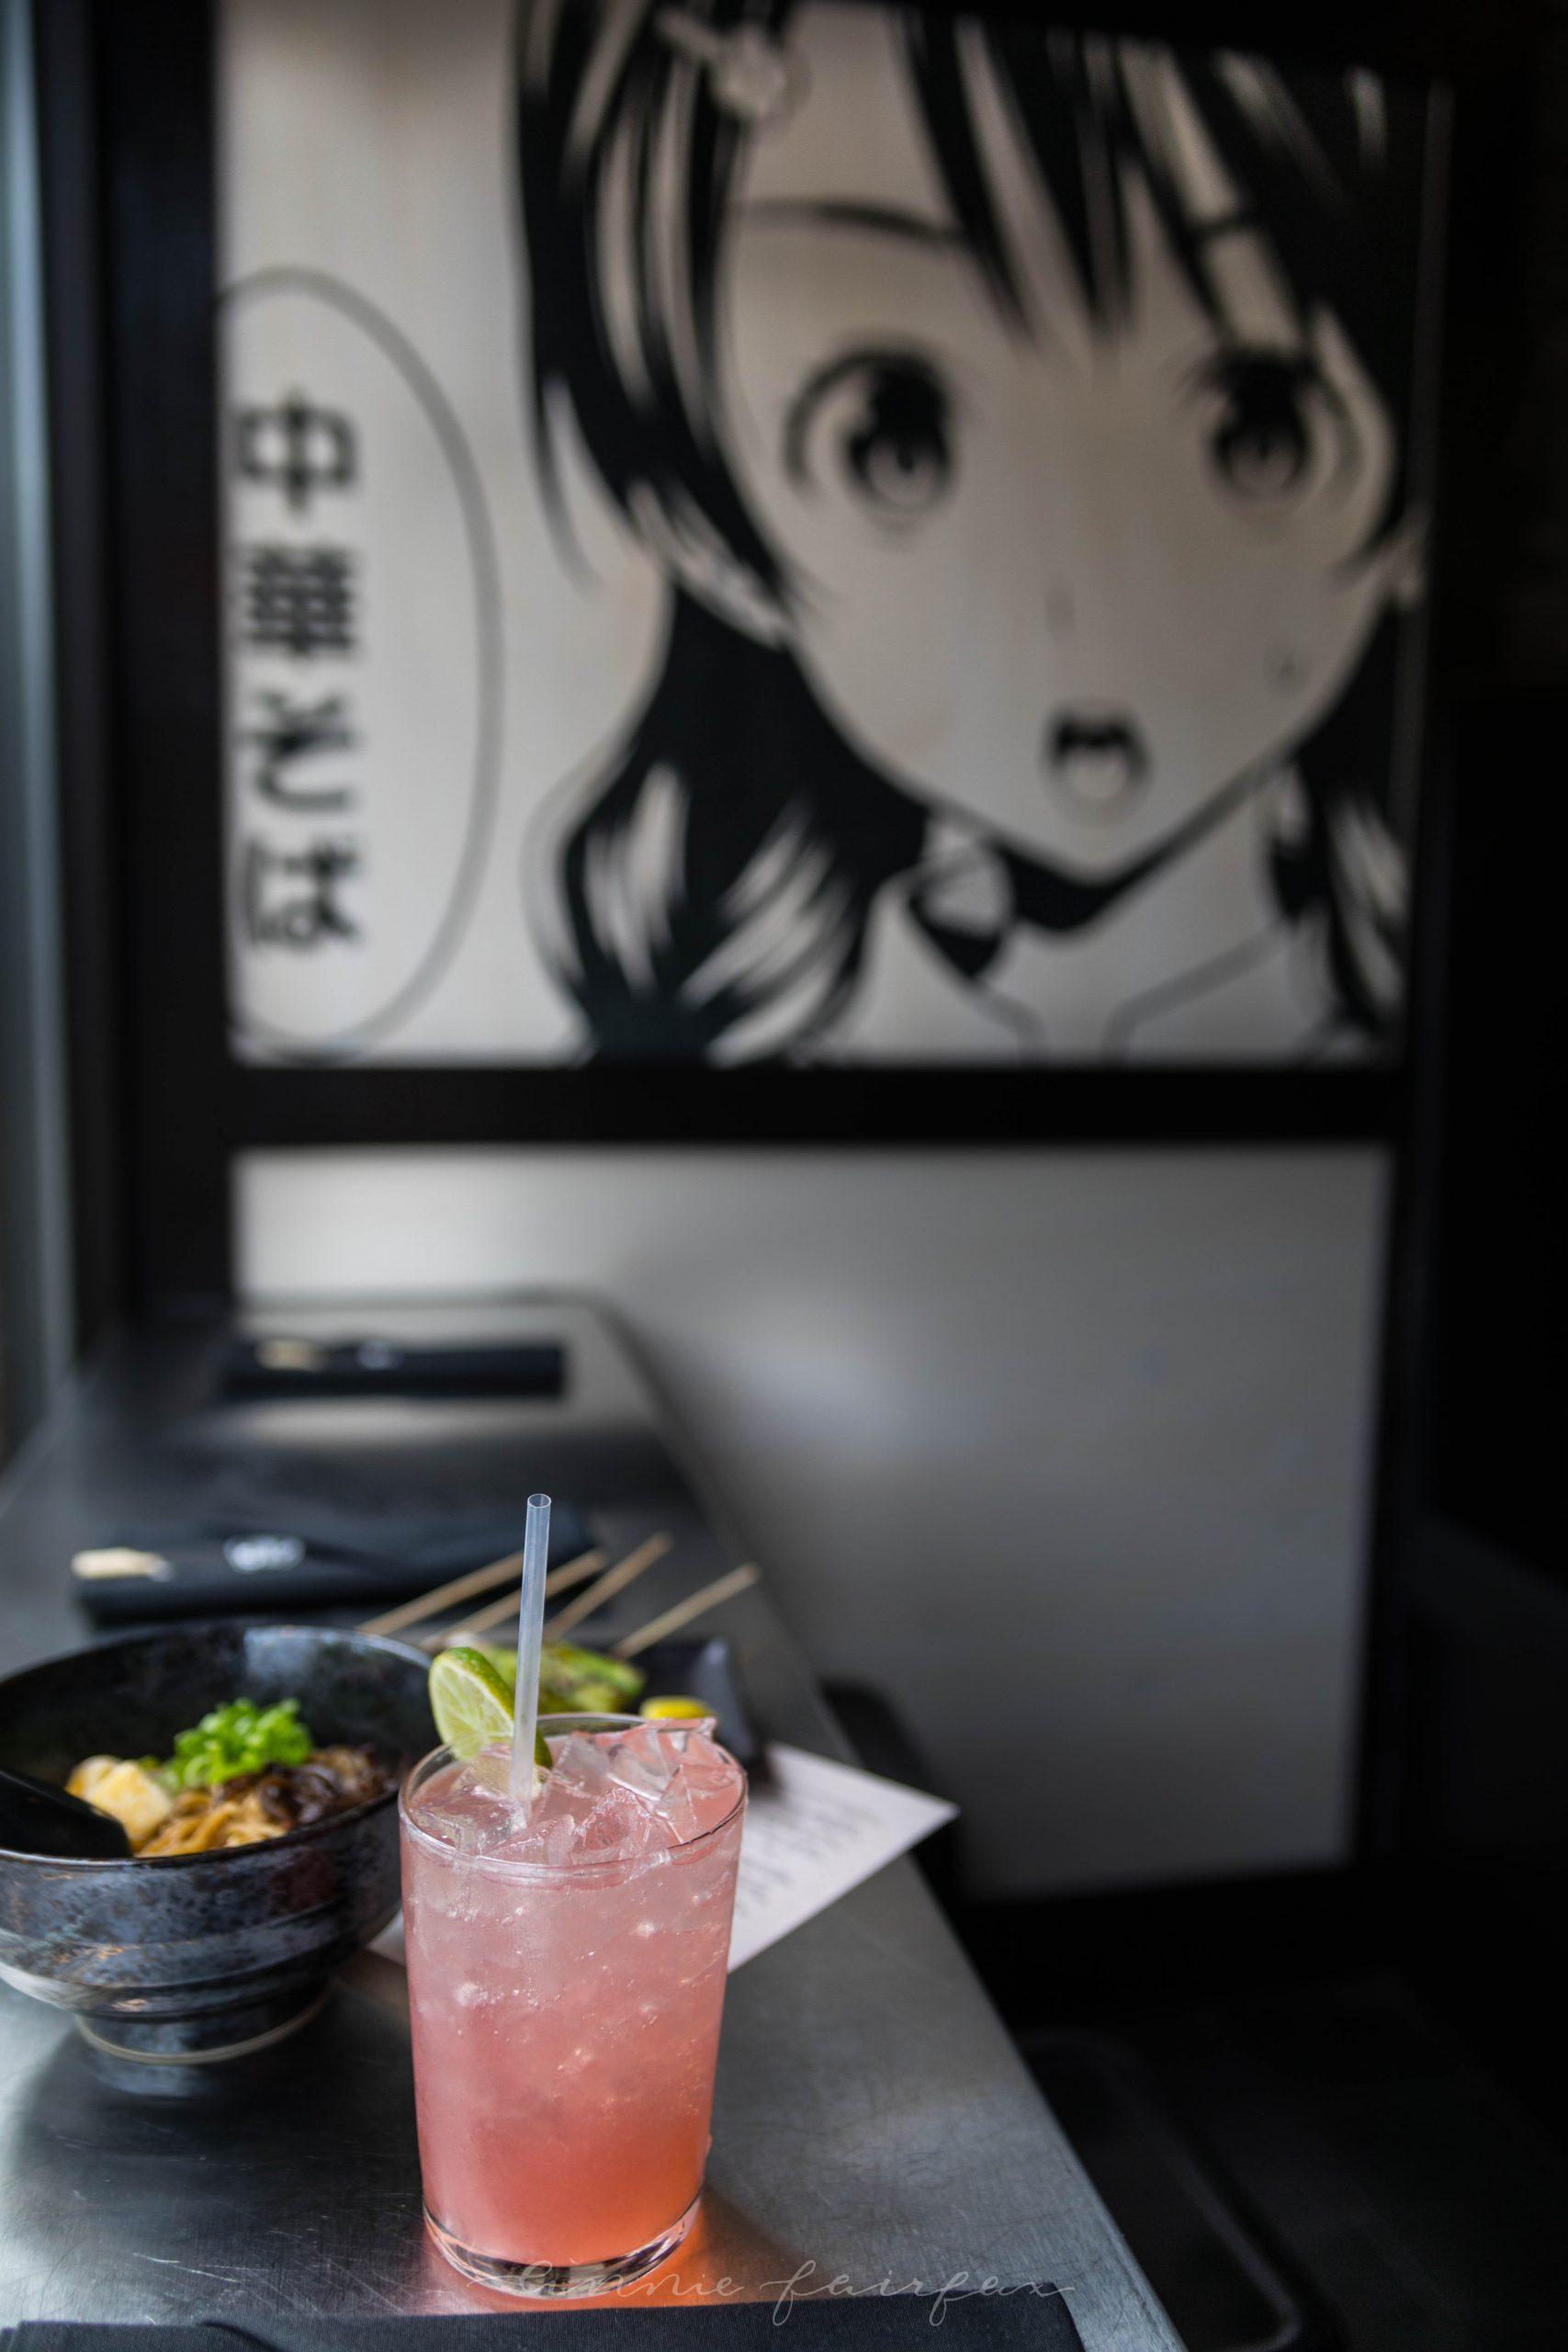 Gaijin Japanese Restaurant in Traverse City Michigan Best Places to Eat in Michigan by Annie Fairfax